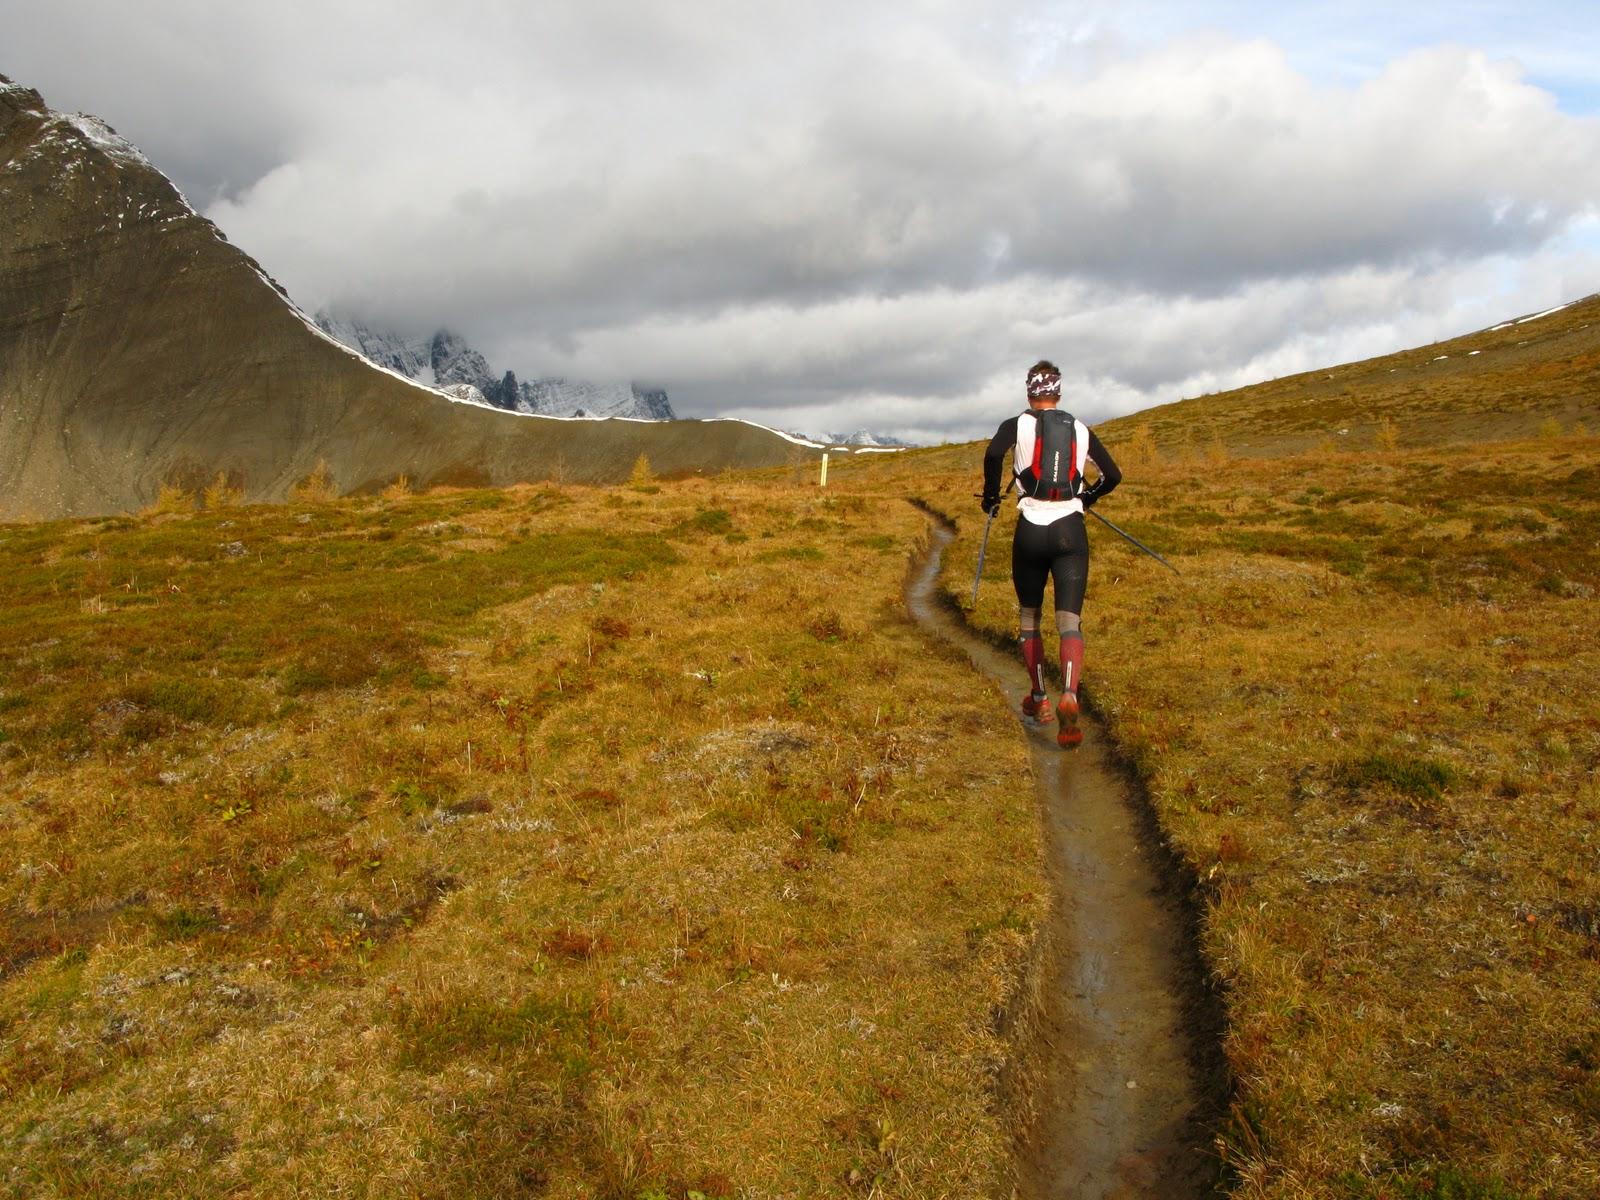 Trail Running Wallpaper Fall running on the rockwall 1600x1200